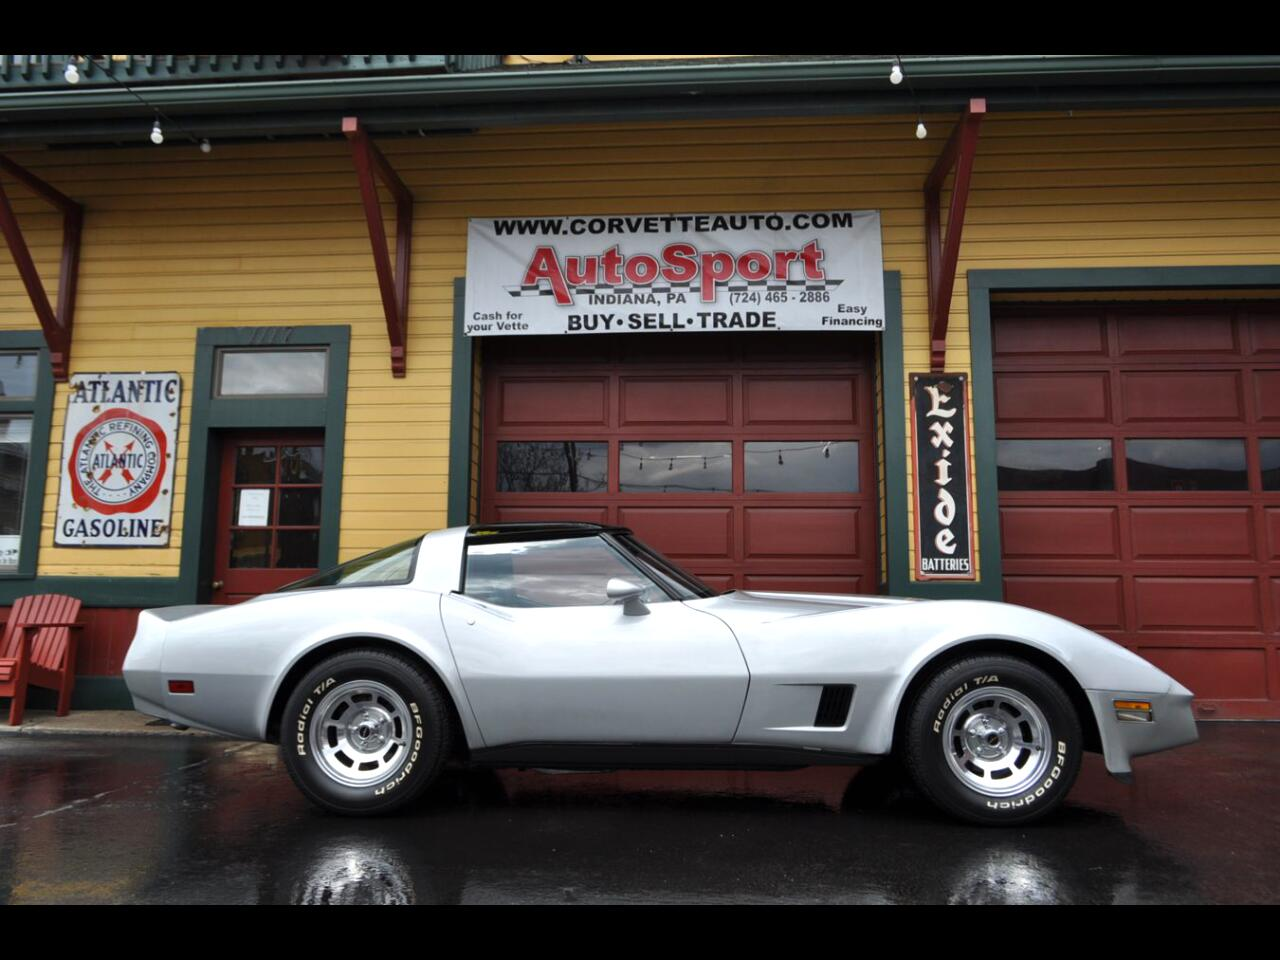 1981 Chevrolet Corvette 1981 Extremely Rare 4sp 13k Org Miles Fully Equipp